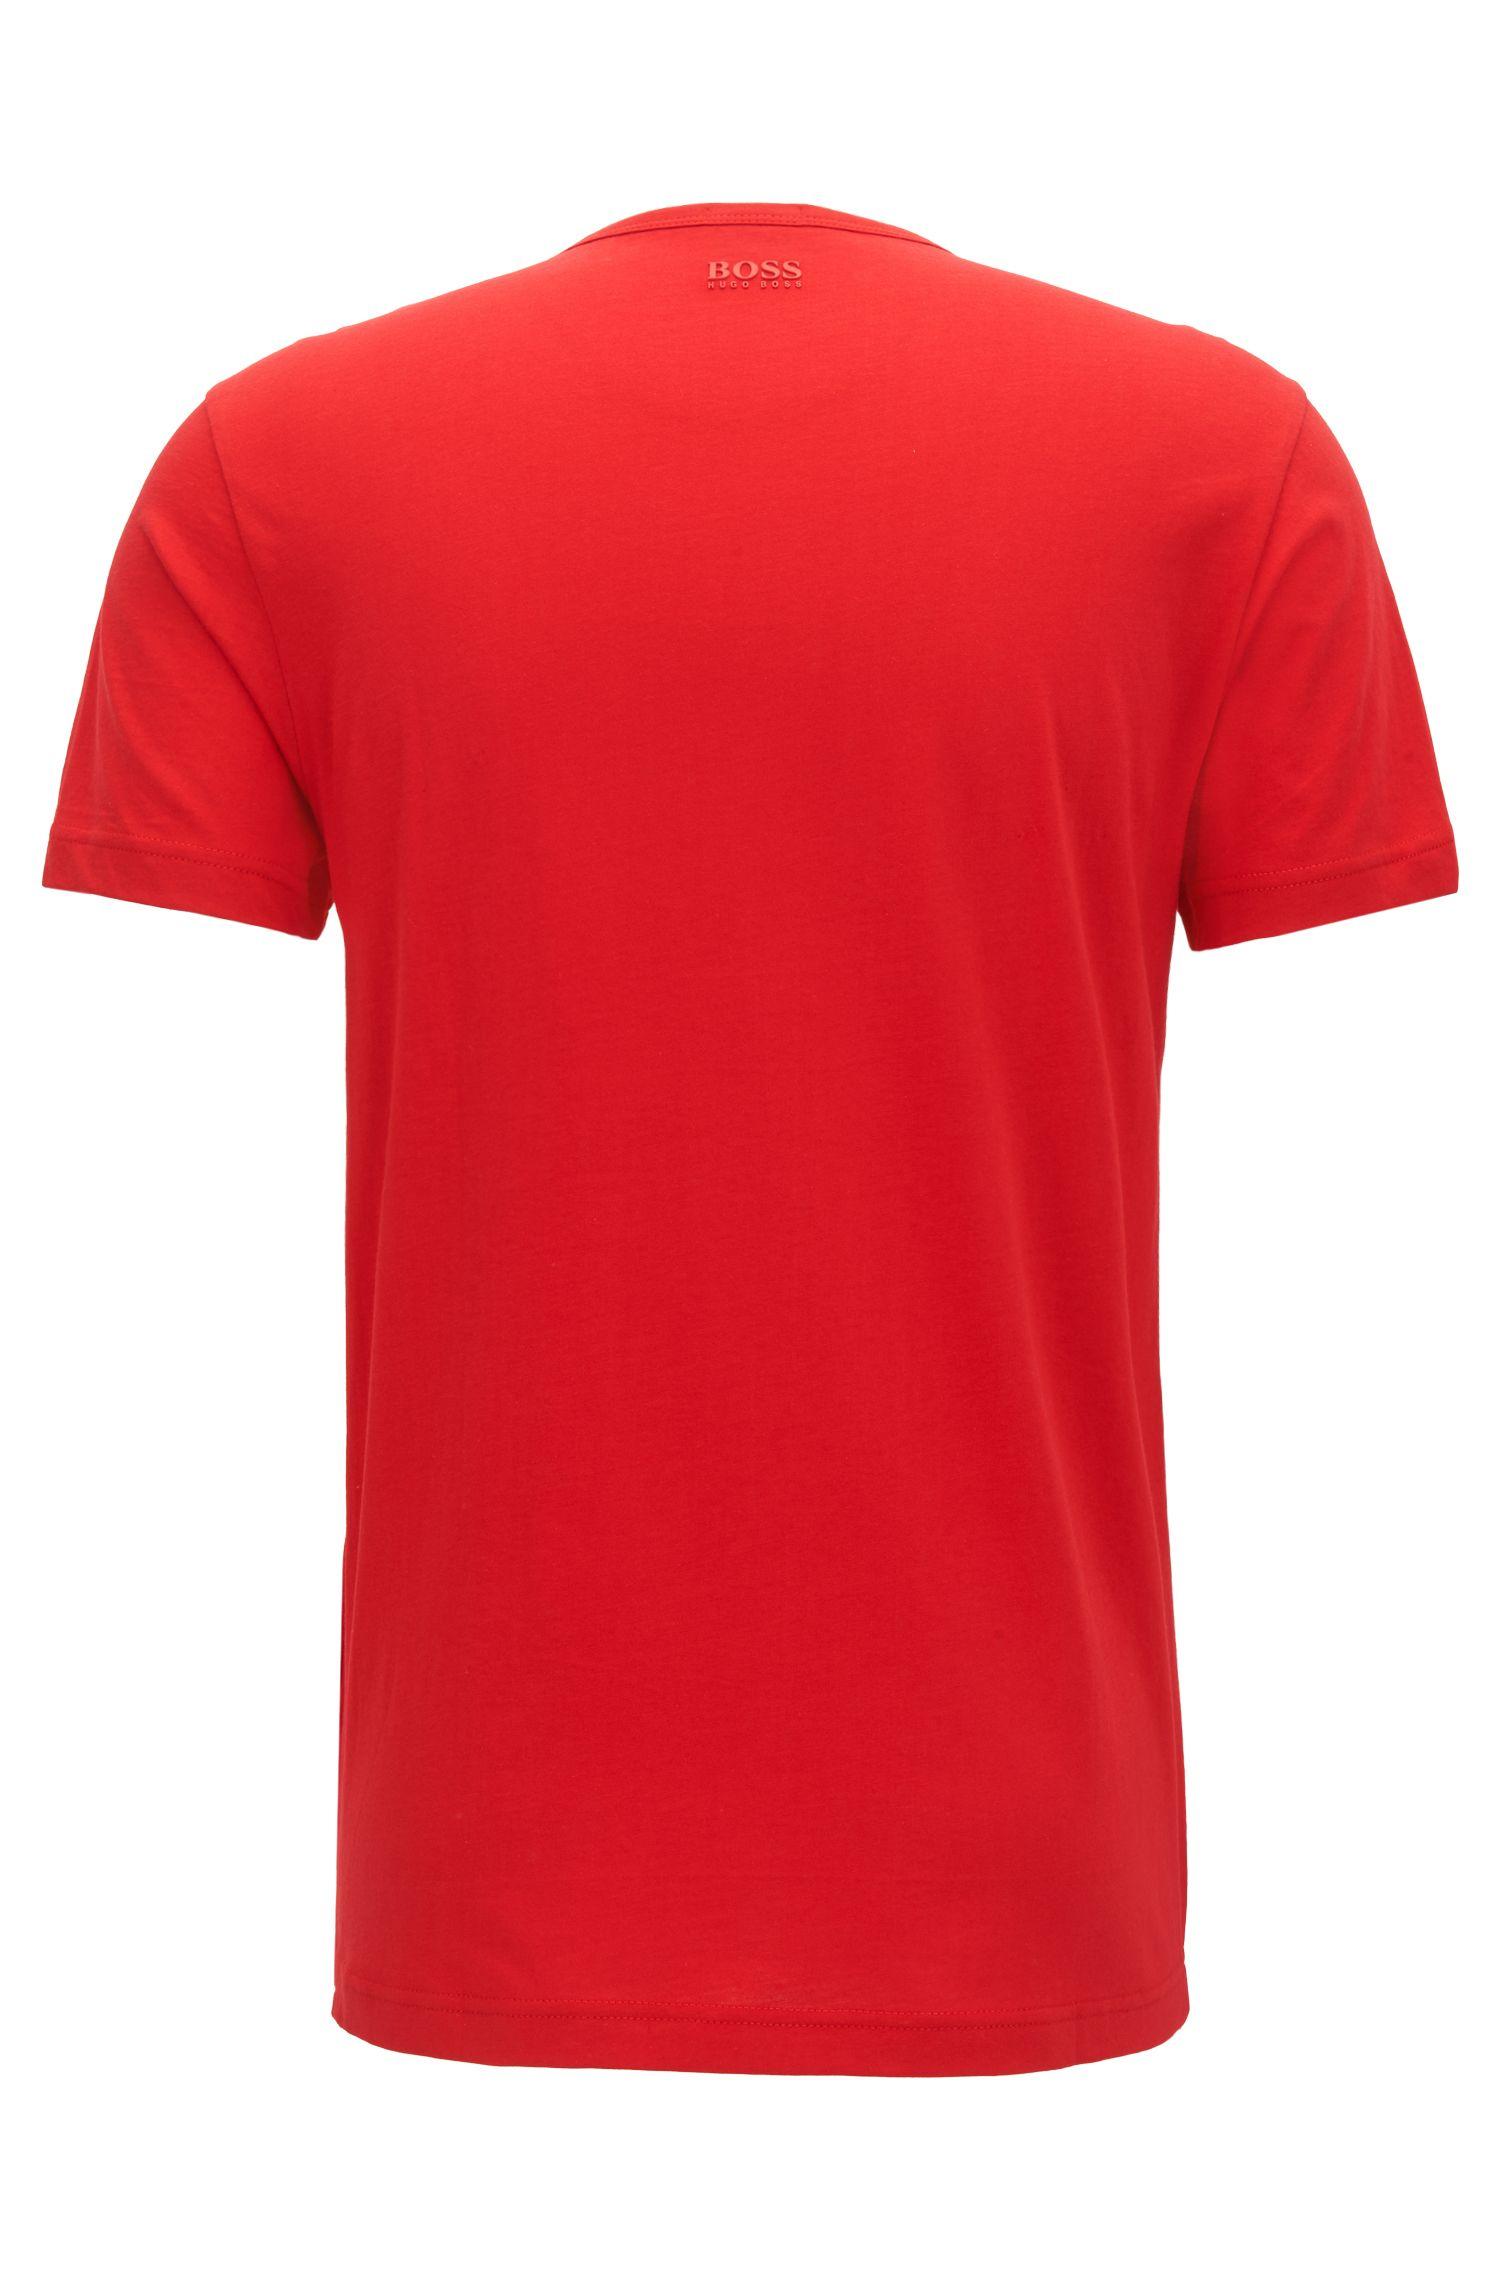 Camiseta de manga corta en algodón con logo tridimensional